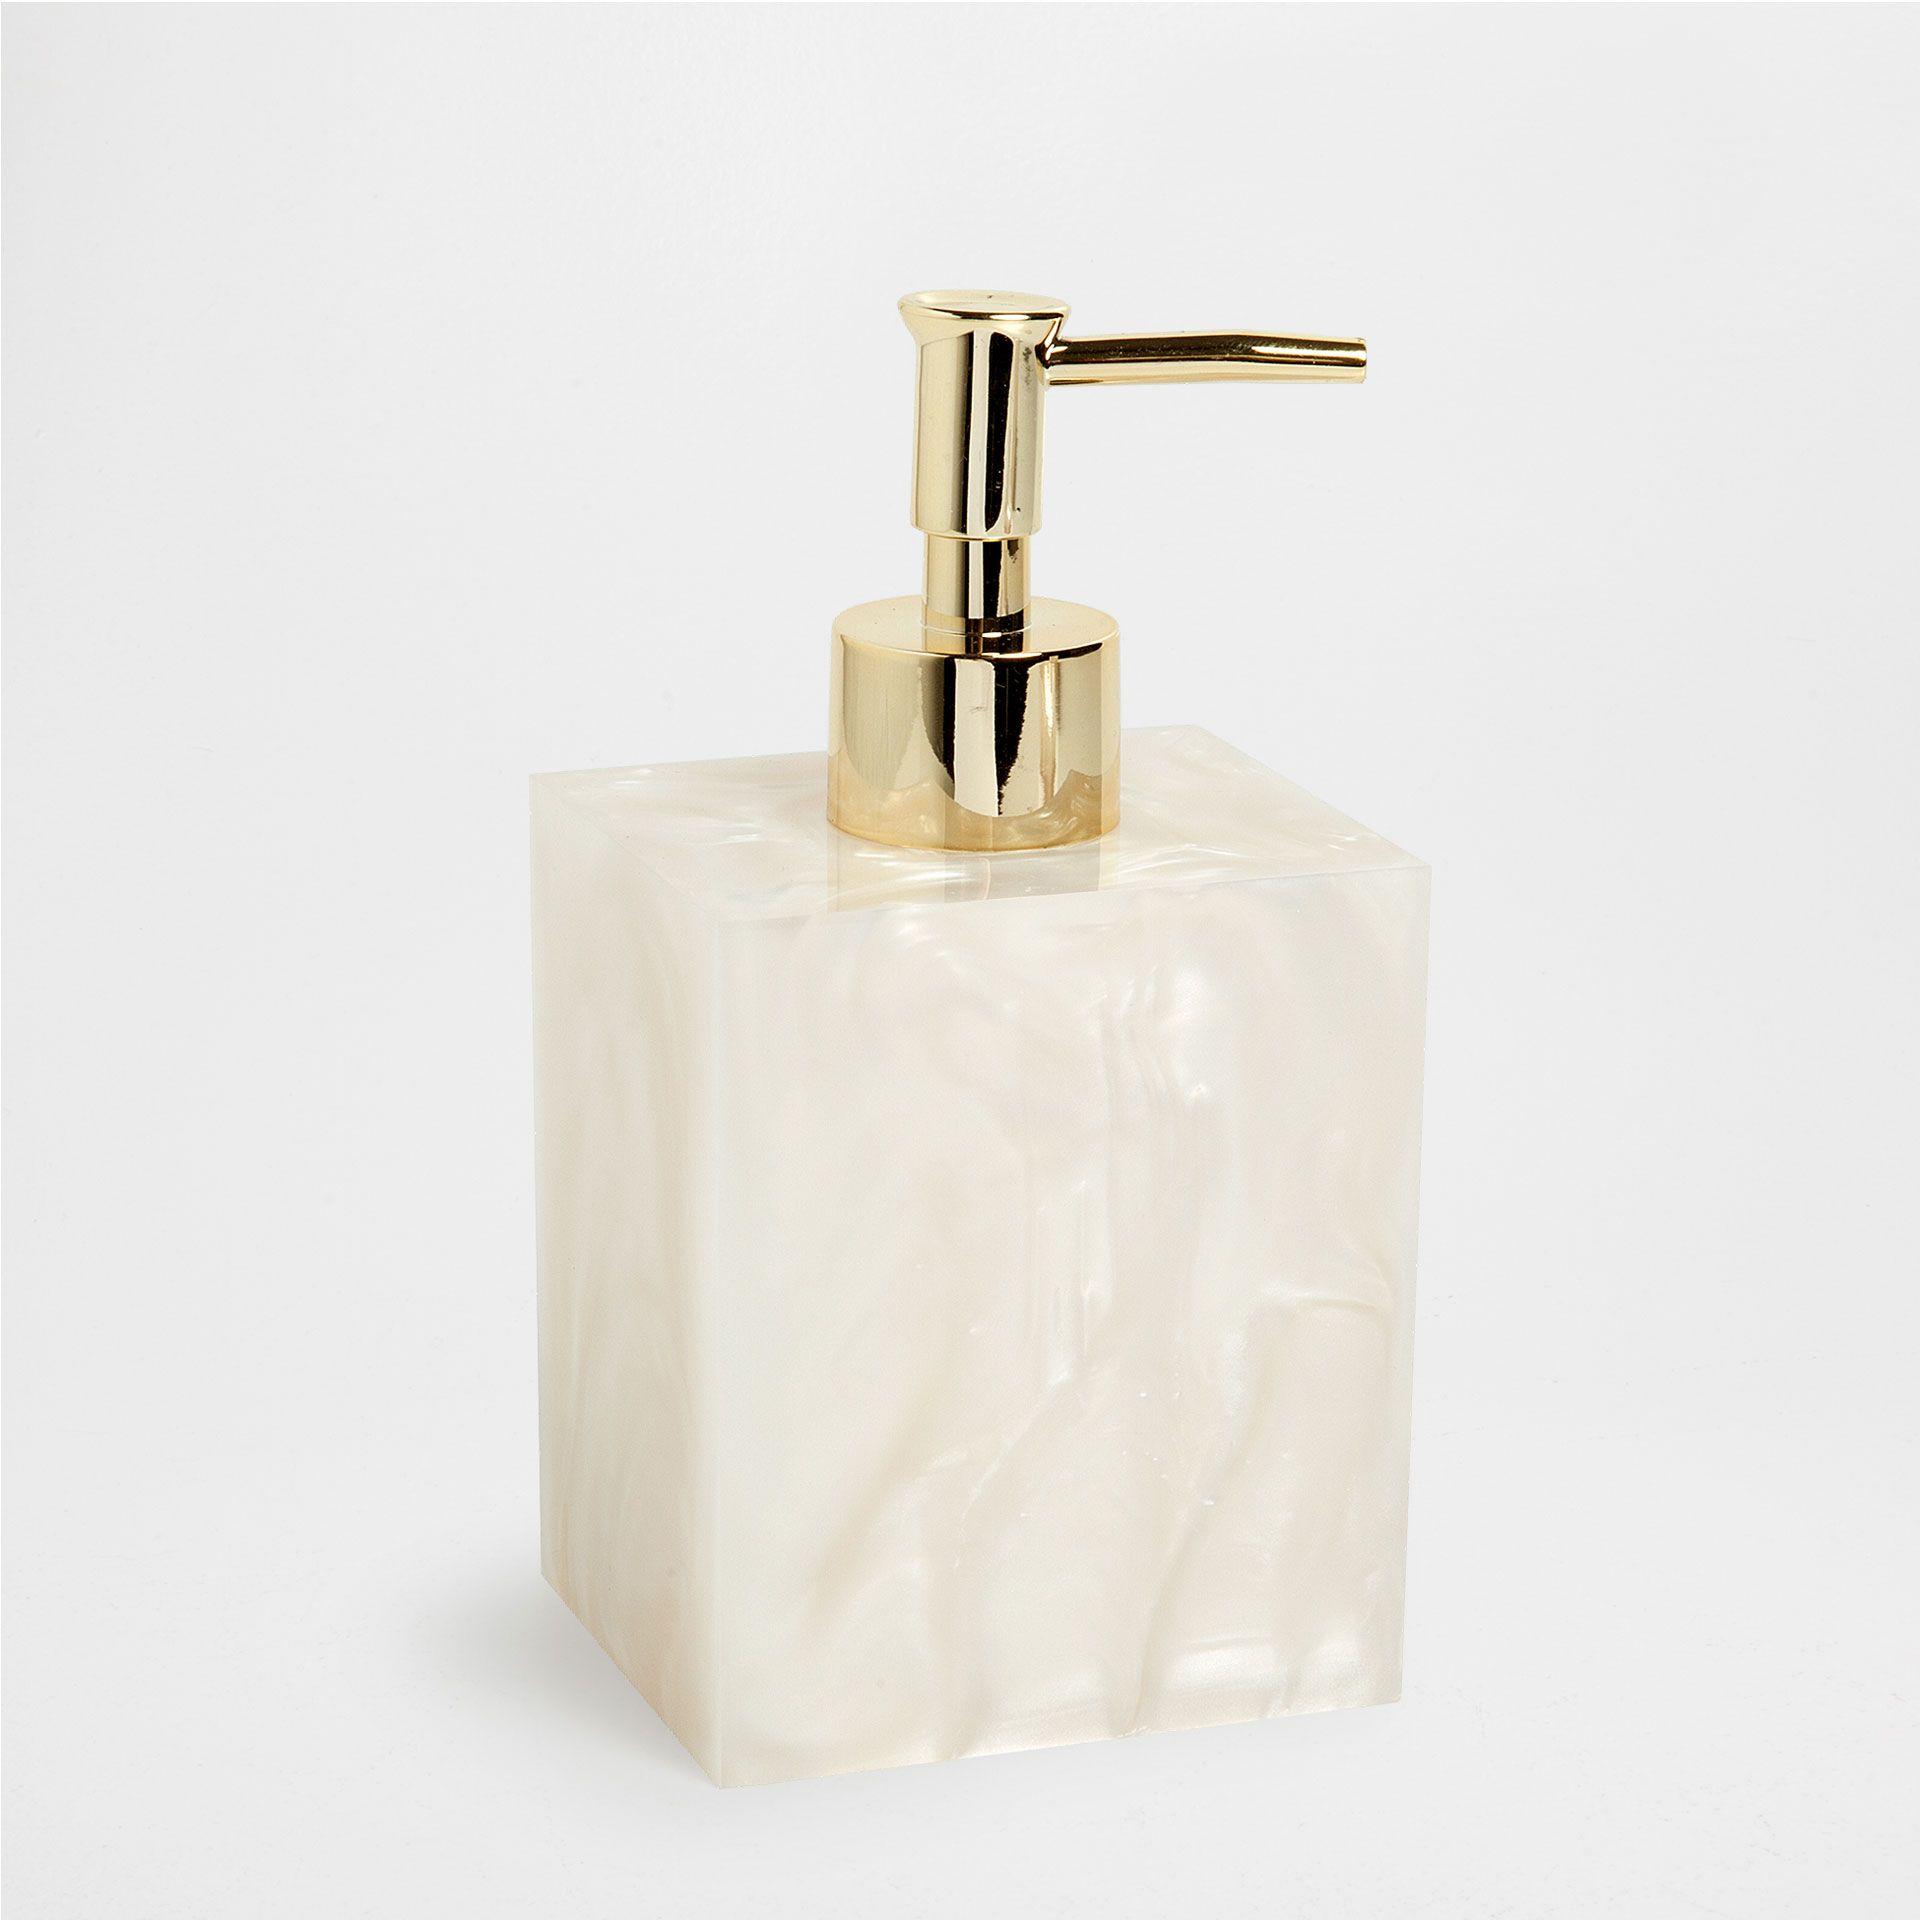 http://www.zarahome.com/fr/bain/accessoires/accessoires-de-bain ...